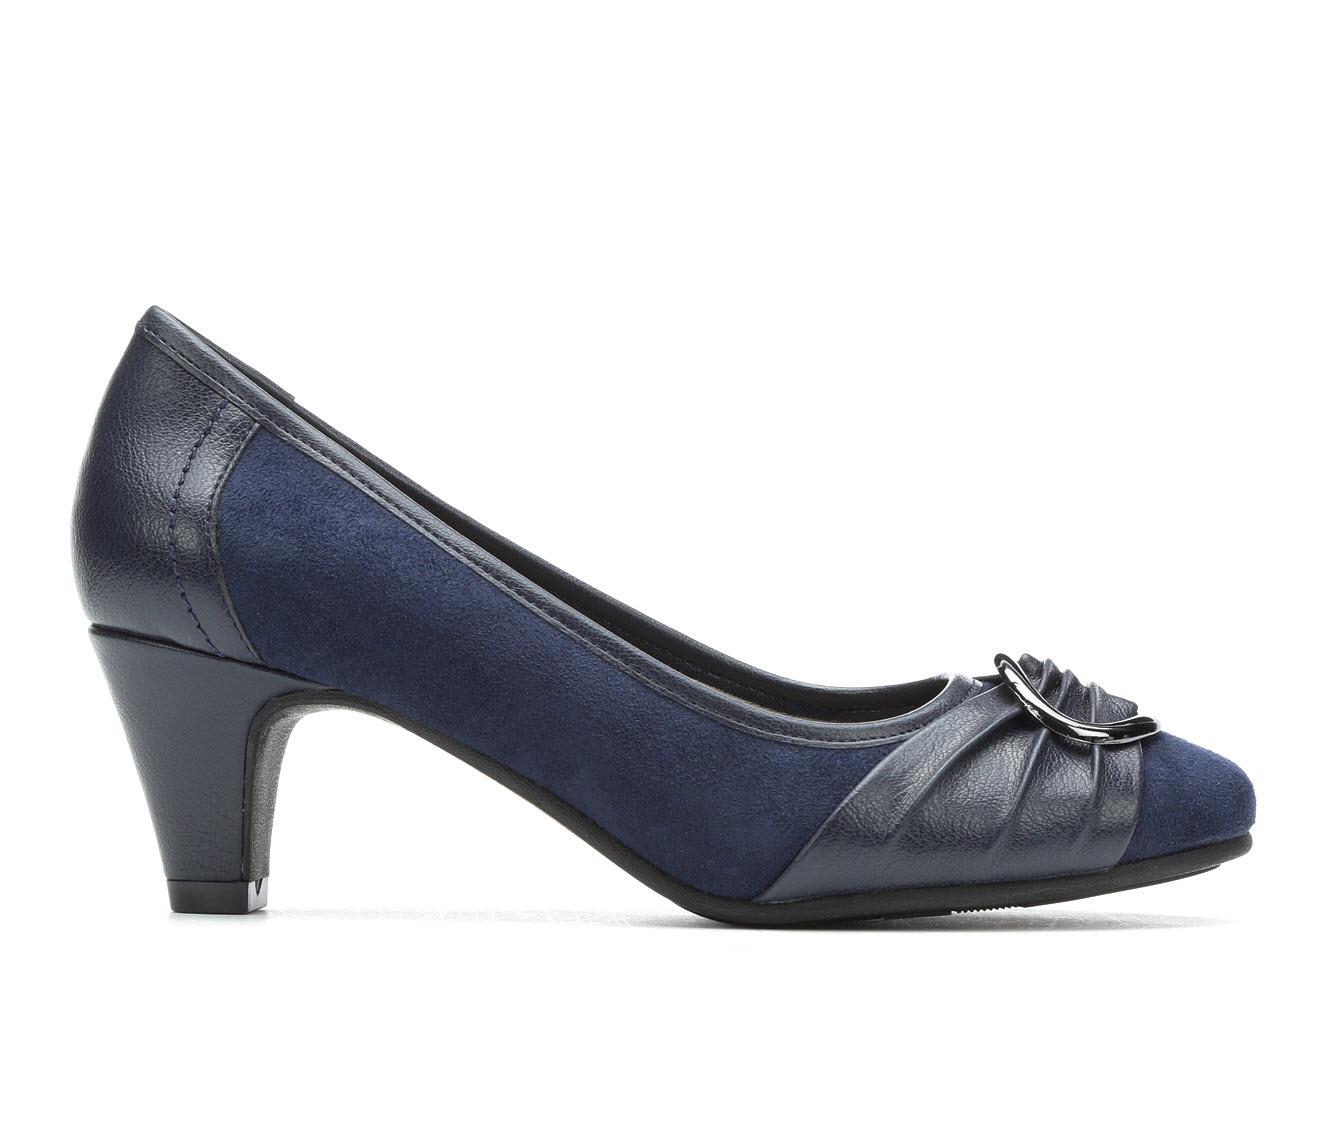 Andiamo Belle Women's Dress Shoe (Blue Faux Leather)